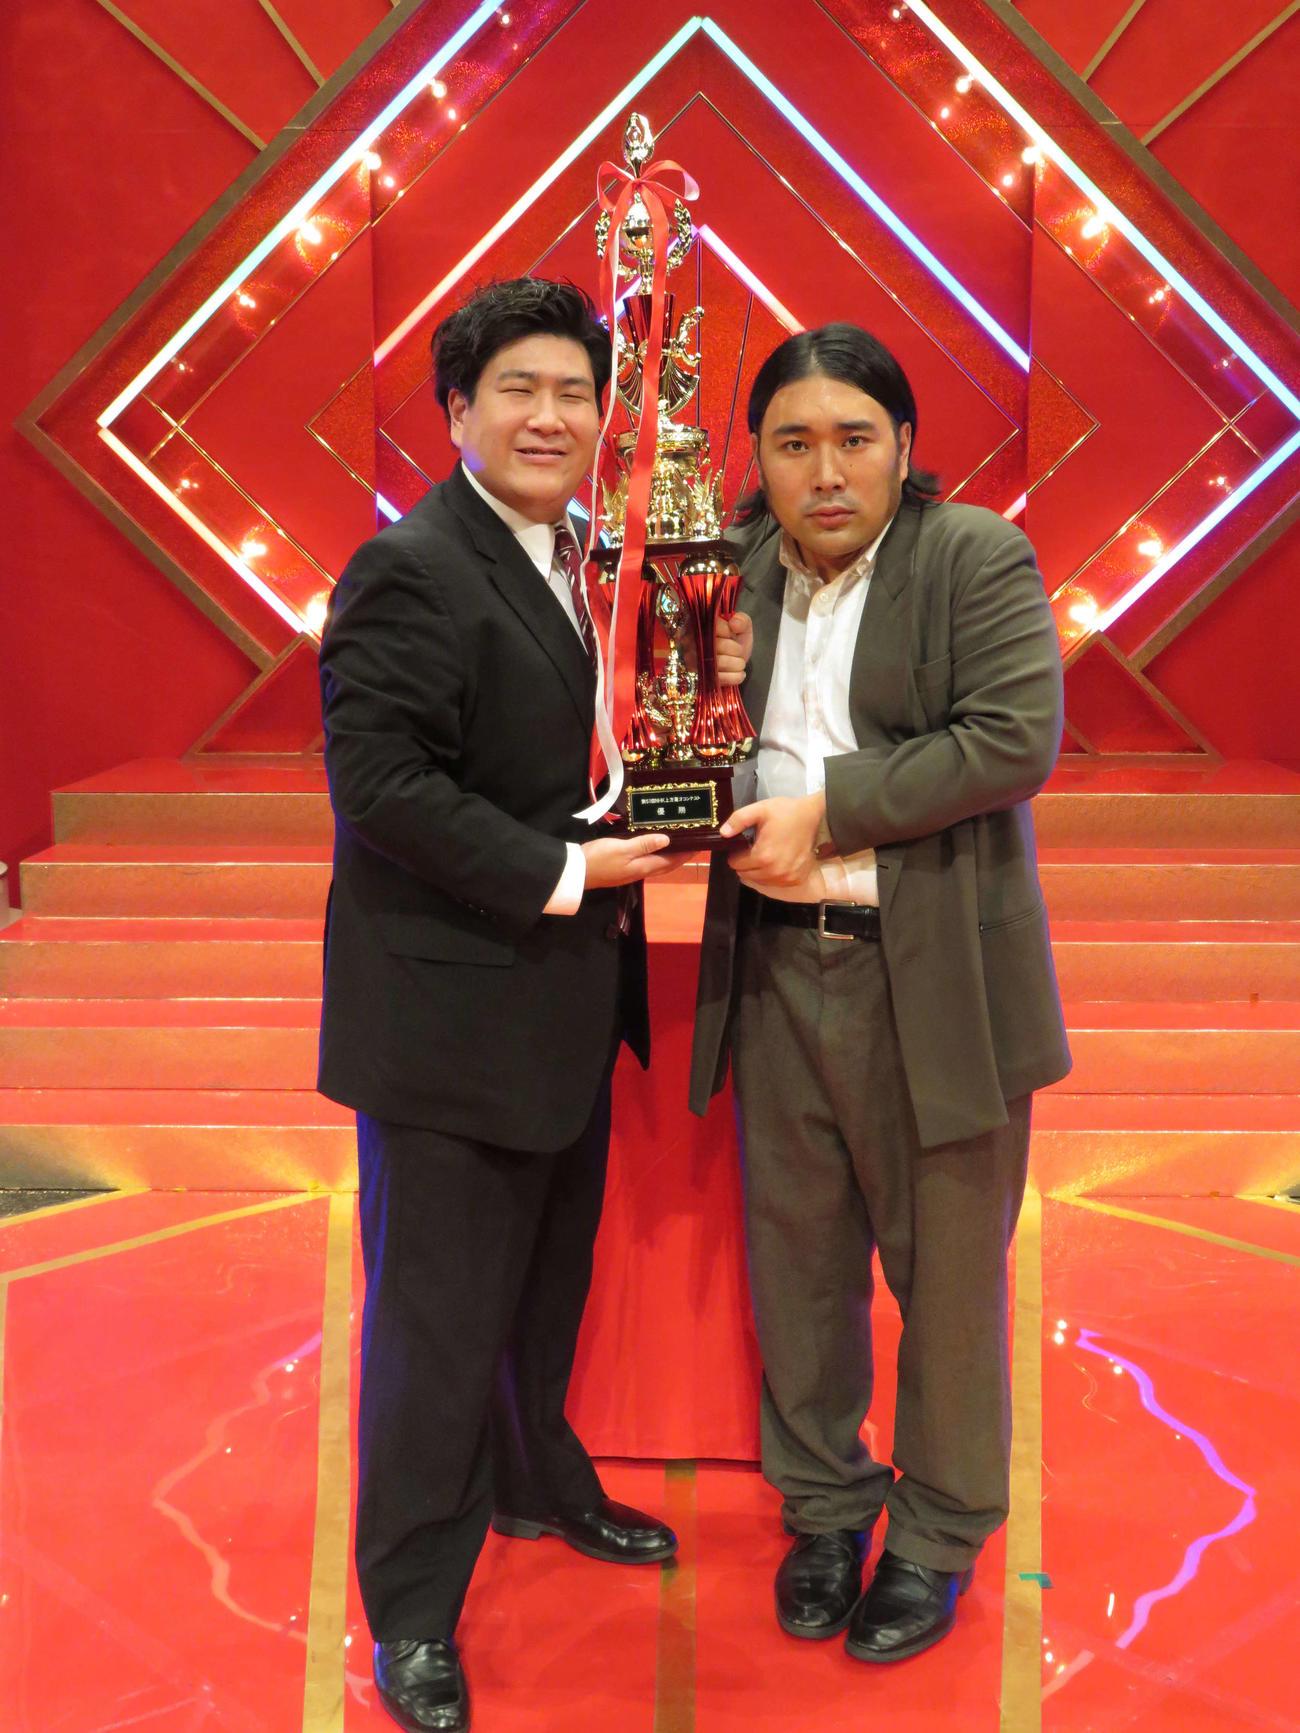 NHK上方漫才コンテストにコントで挑み、優勝した「ビスケットブラザーズ」きん(左)と、原田泰雅(撮影・村上久美子)